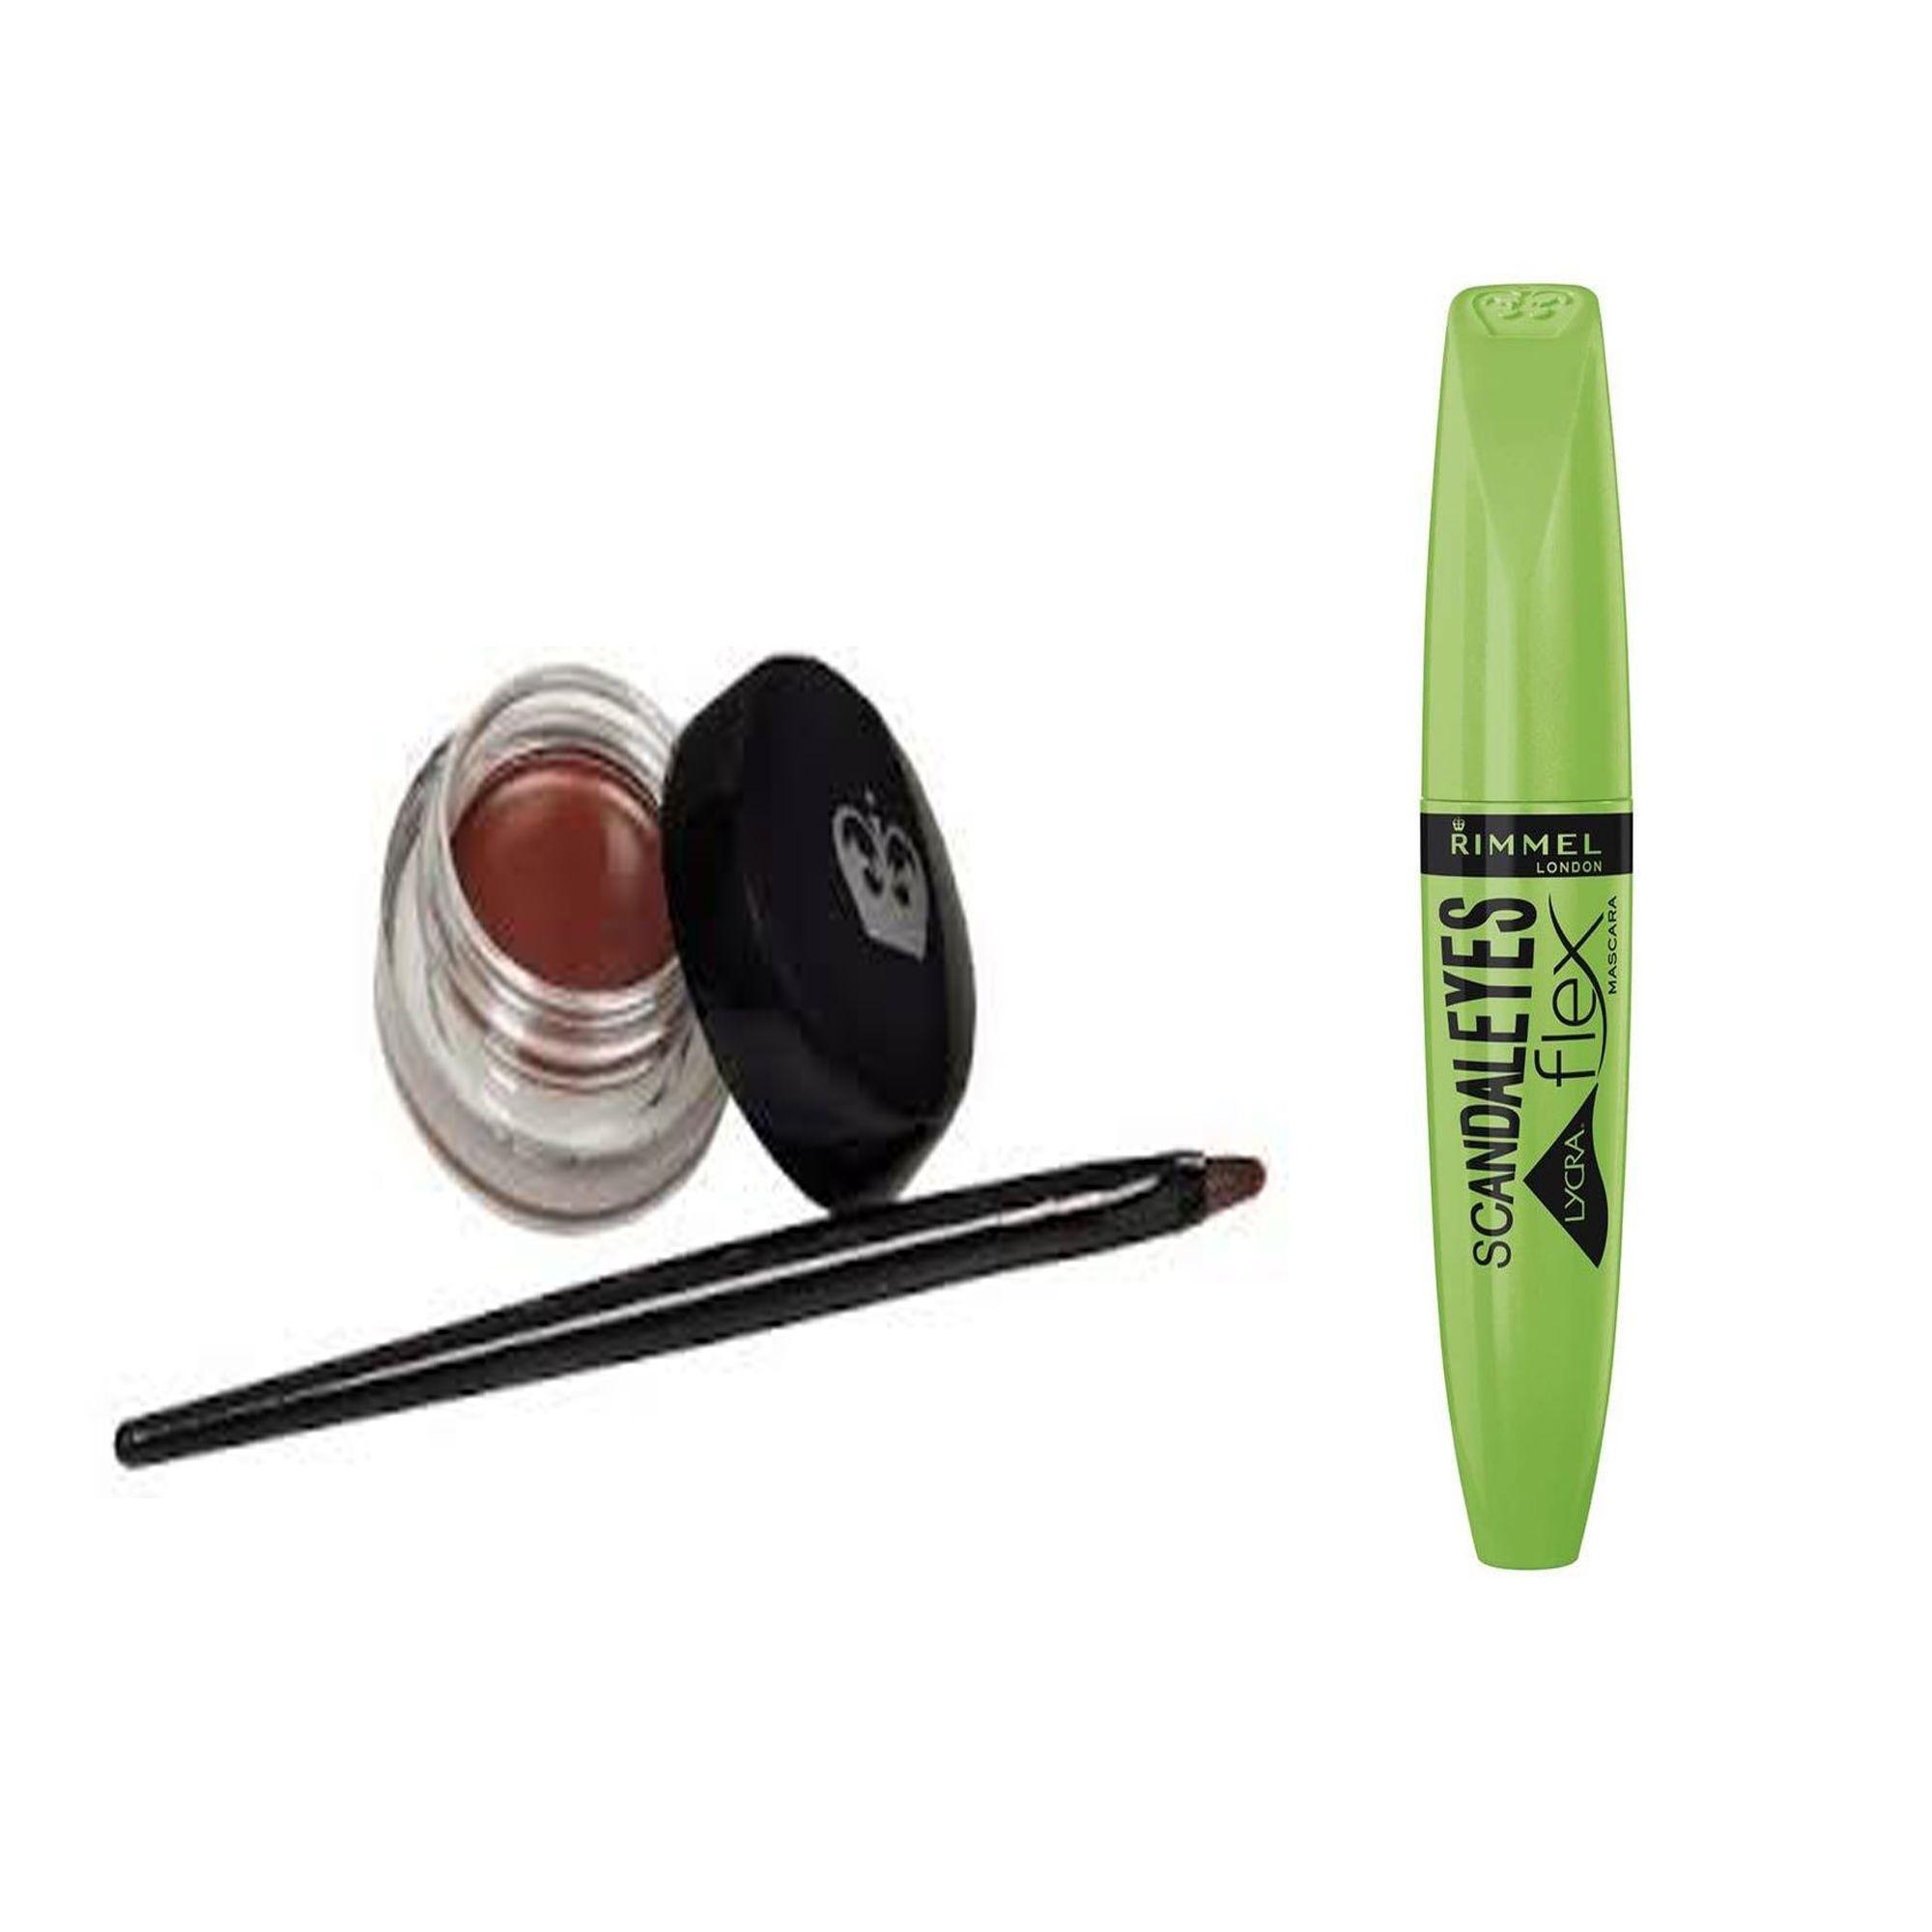 84d92ba2a9f Rimmel Scandal Eyes Lycra Flex Mascara - Black + Scandal Eyes Waterproof  Gel Eyeliner - 002 Brown